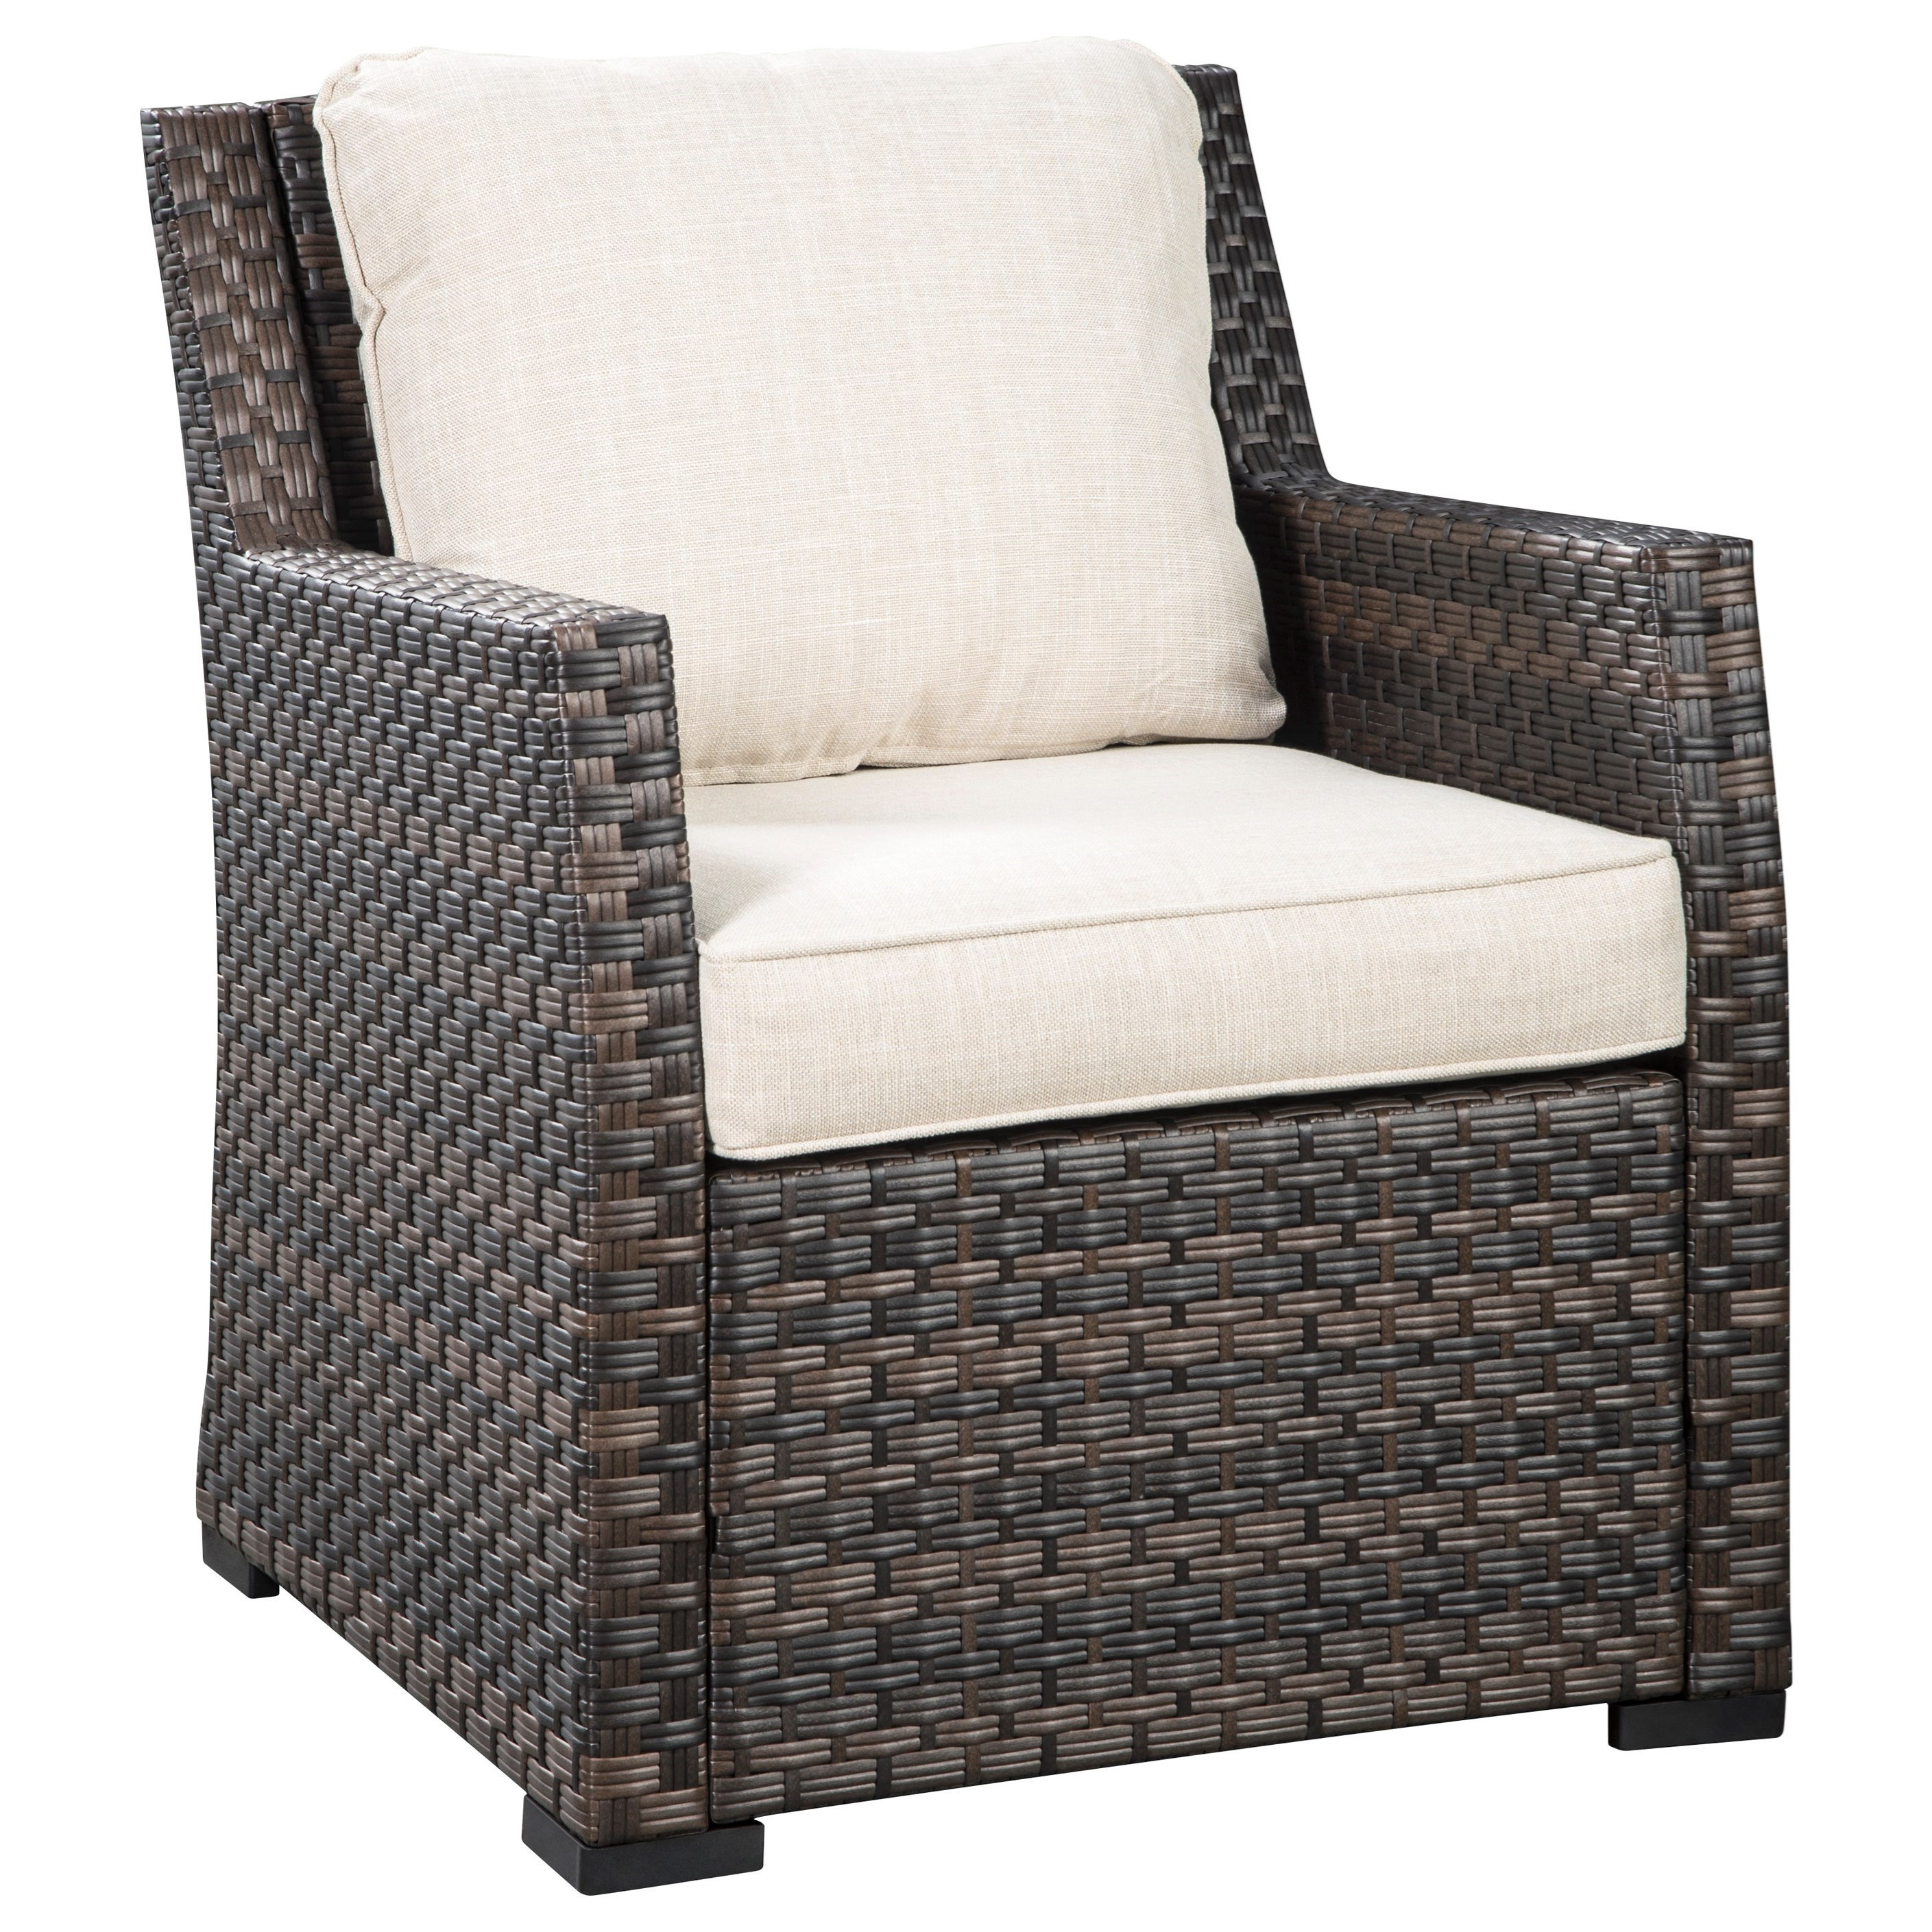 Sandpiper Lounge Chair w/ Cushion at Belfort Furniture